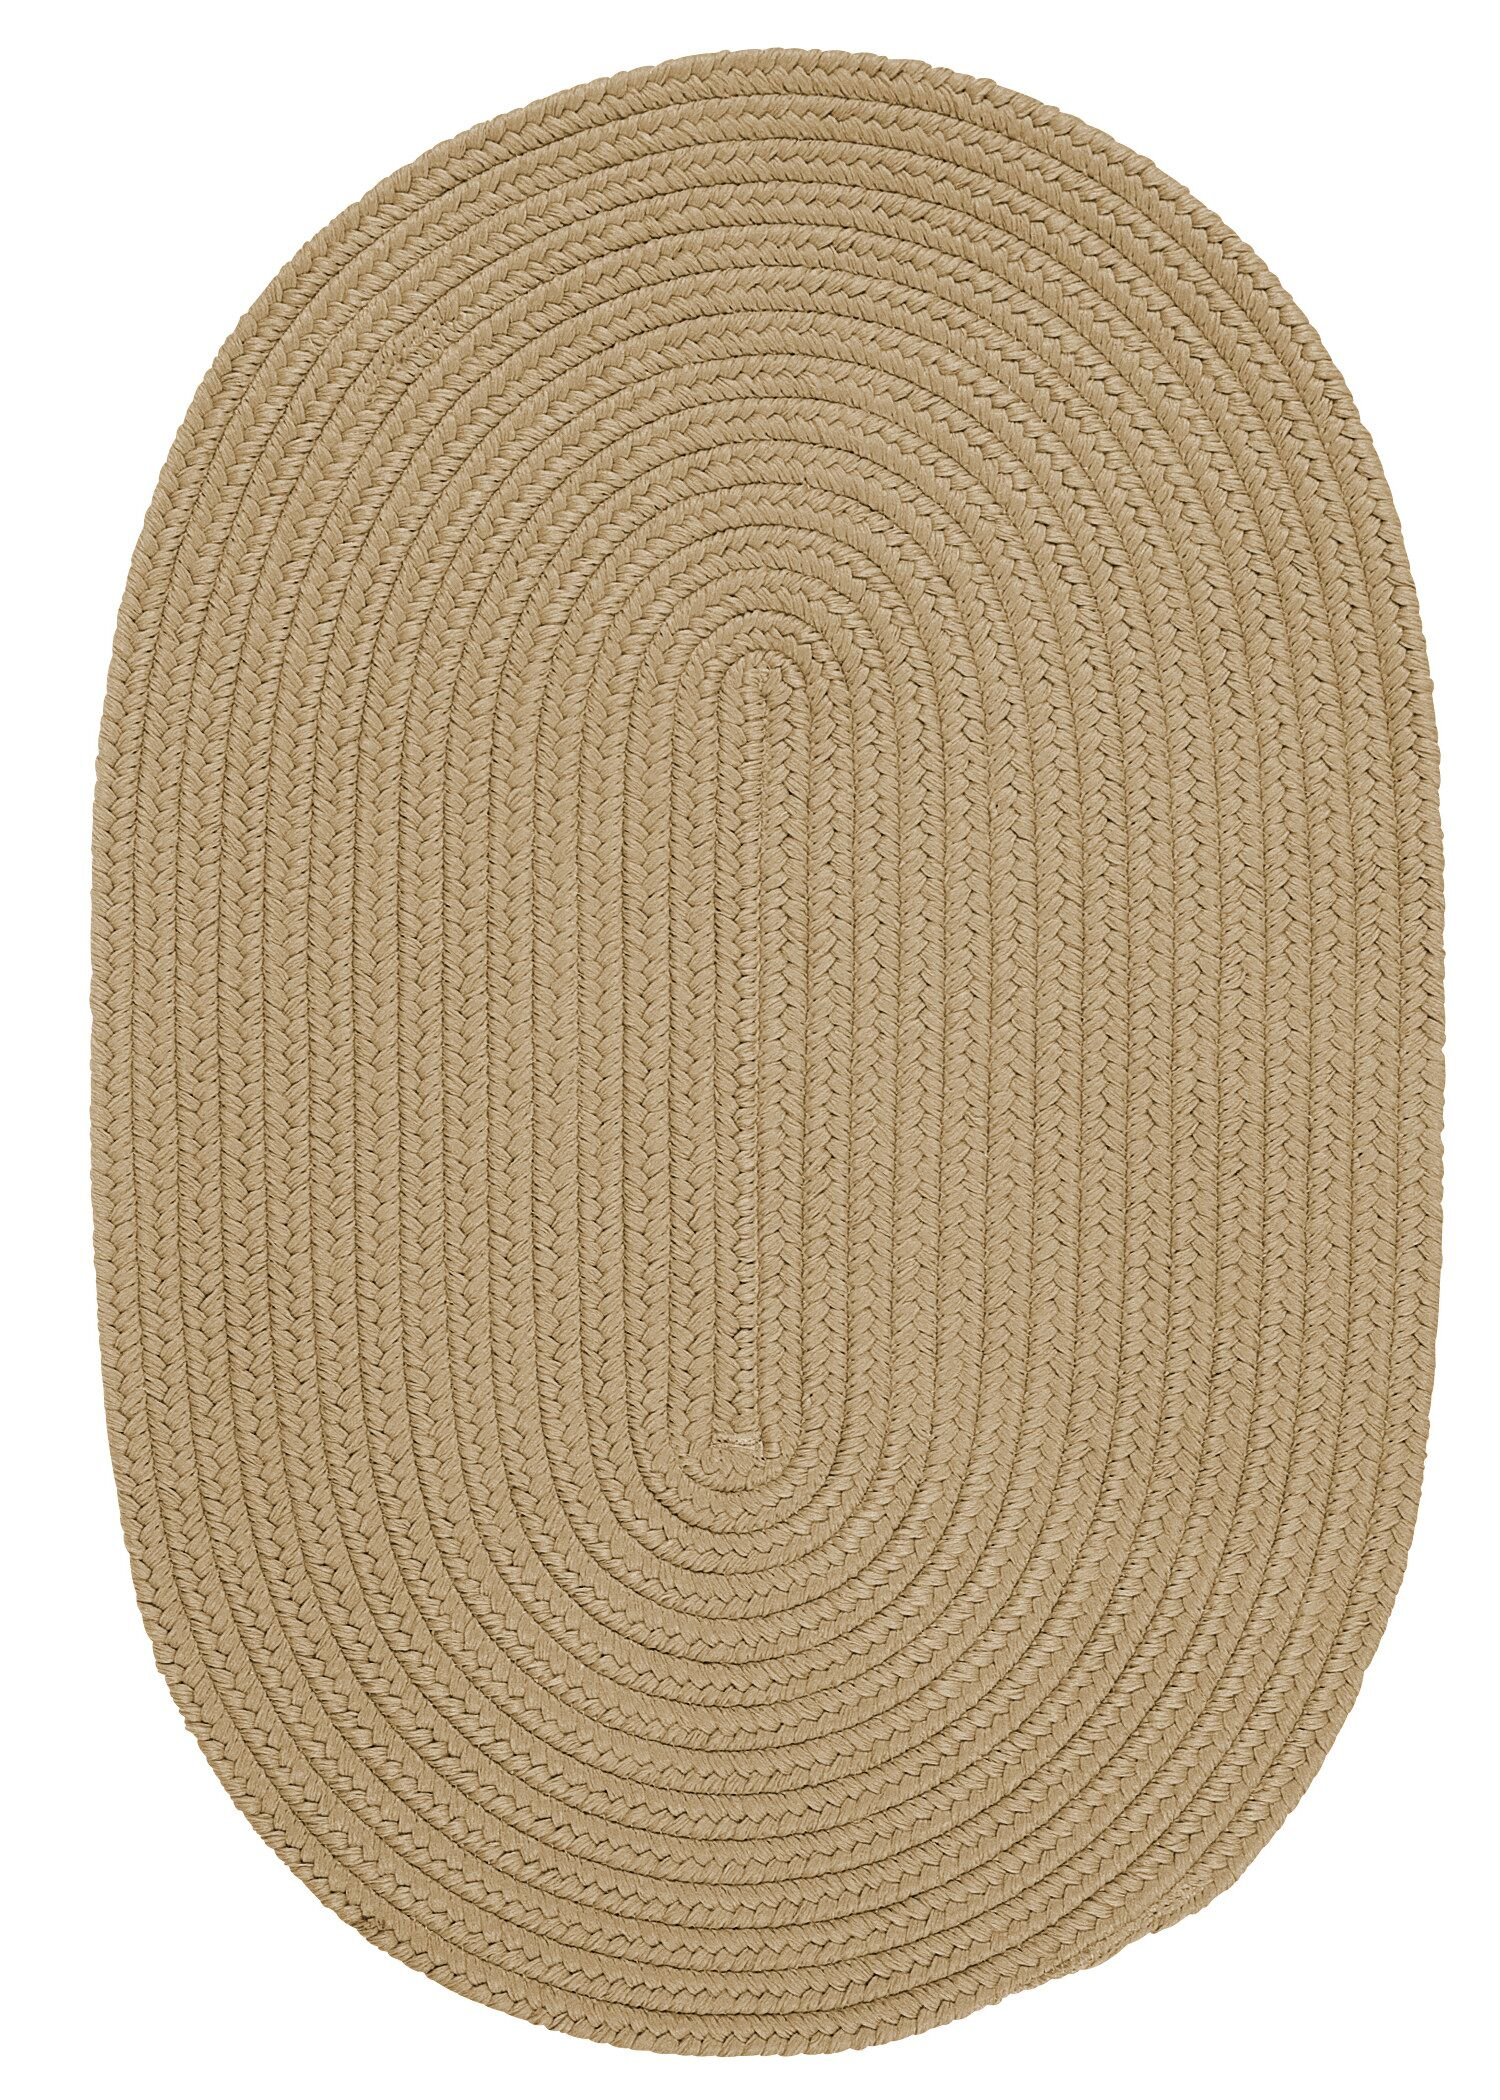 Mcintyre Cuban Sand Indoor/Outdoor Area Rug Rug Size: Oval 12' x 15'